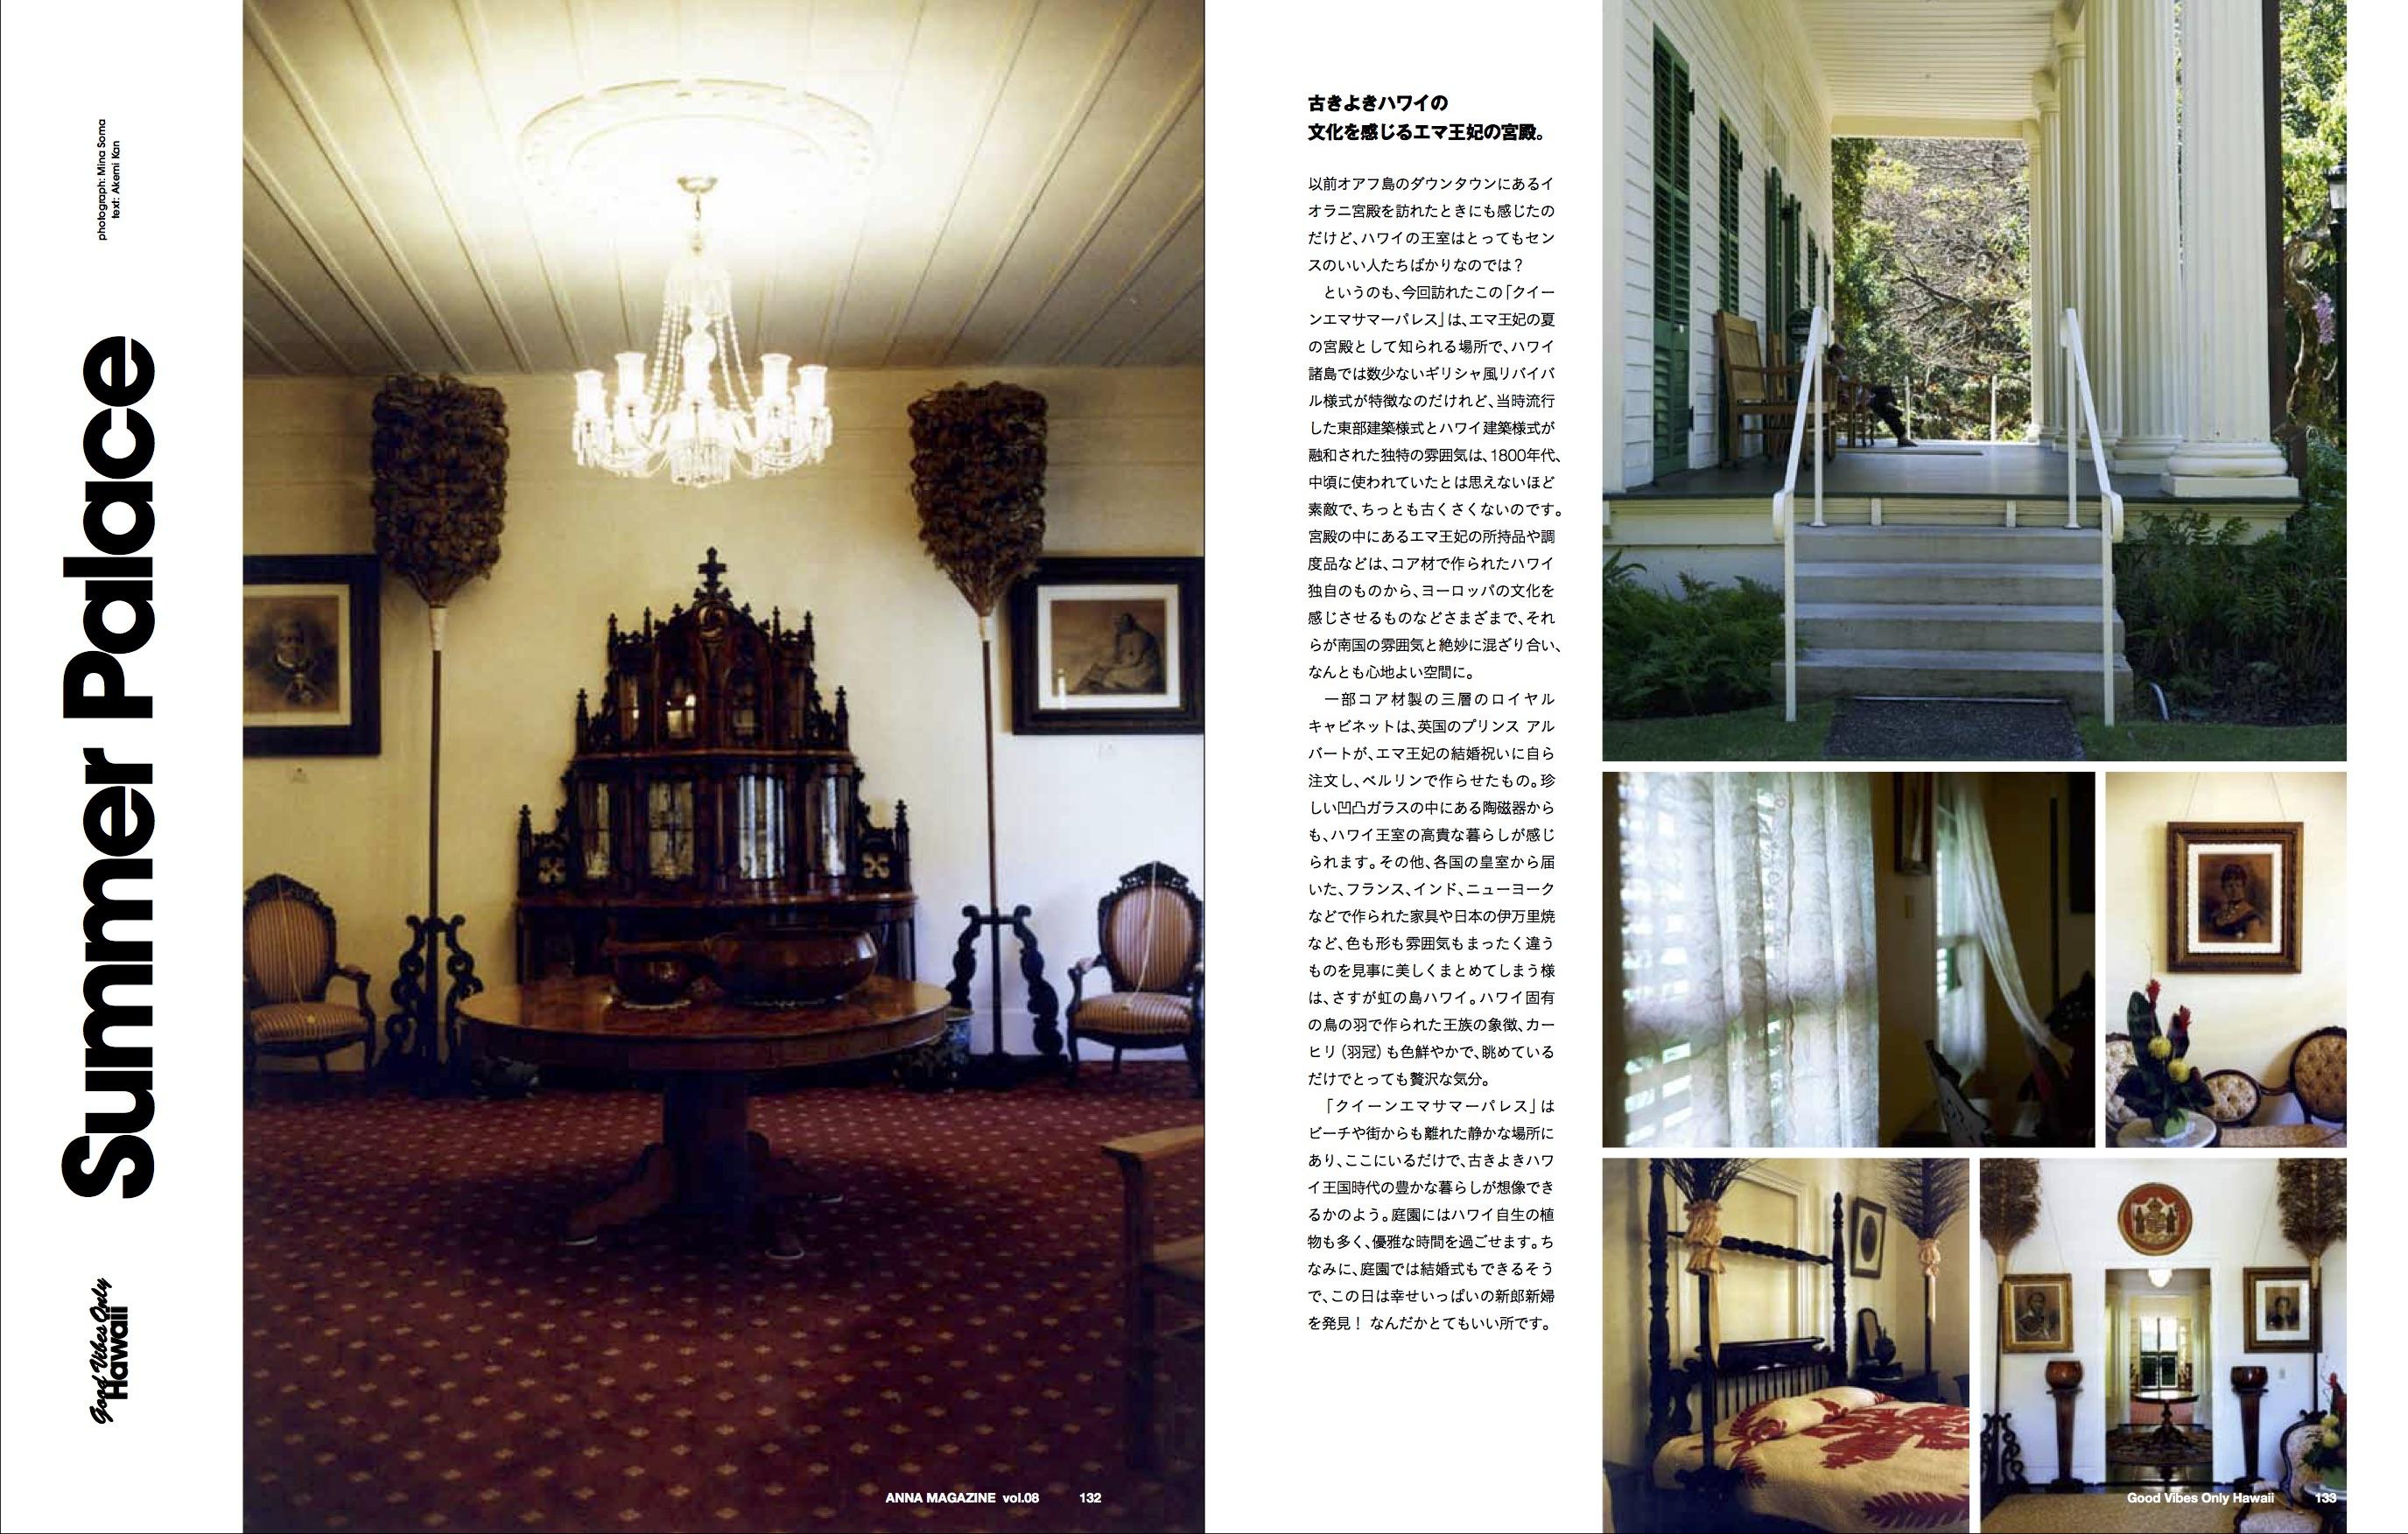 anna magazine vol.8 P64